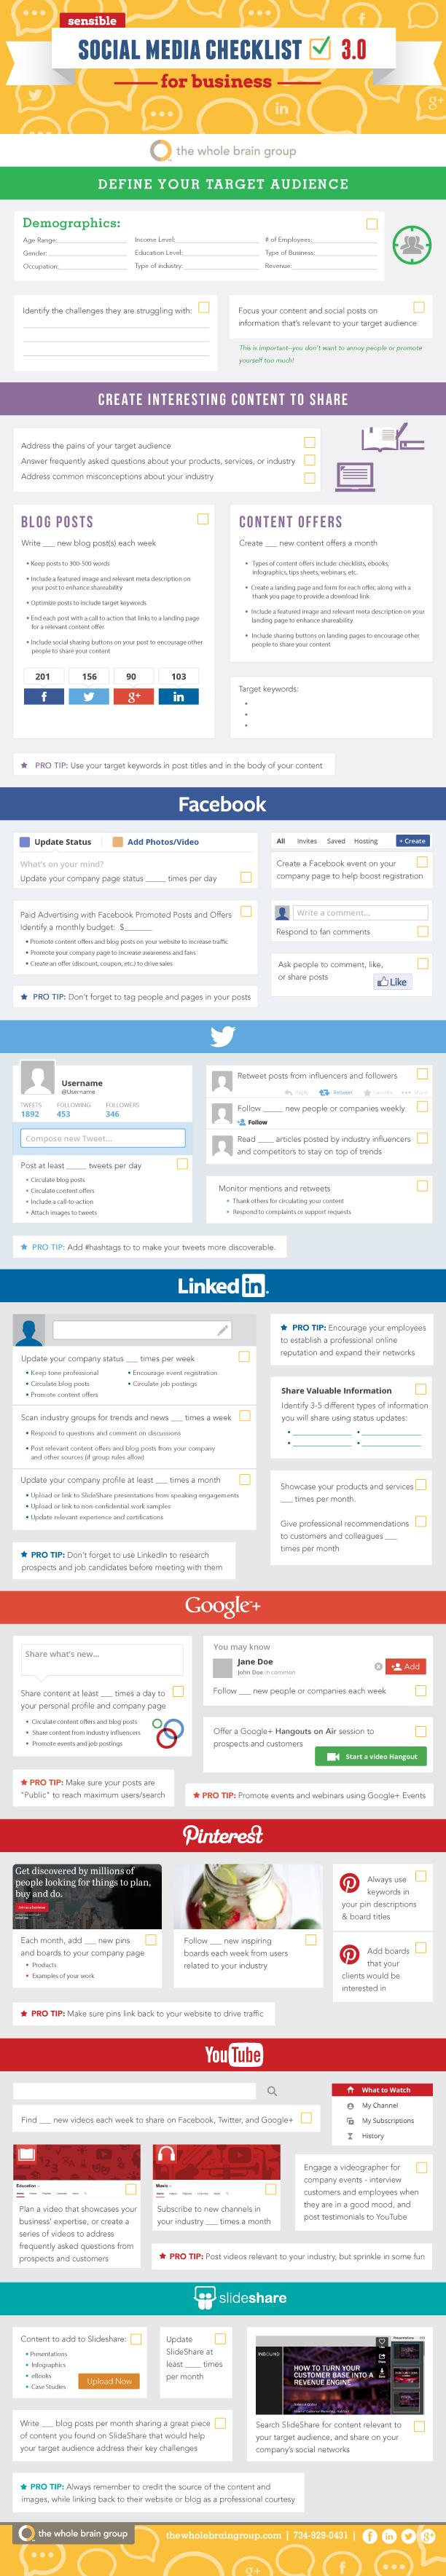 Sensible Social Media Checklist for Businesses v3.0